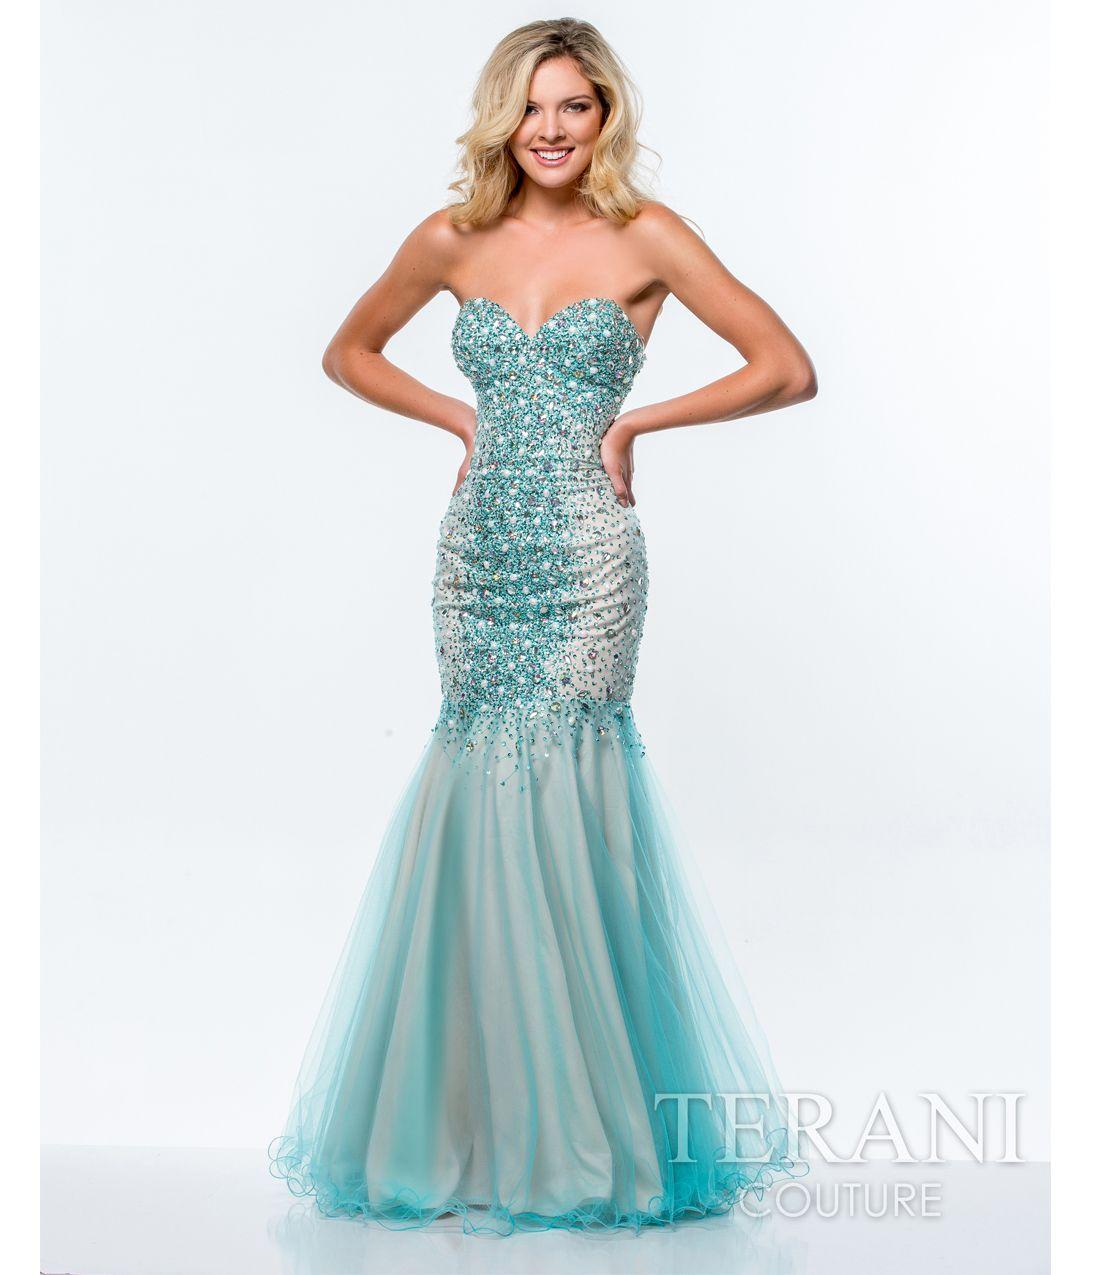 Contemporary Cheap Prom Dresses In Orlando Fl Gift - All Wedding ...